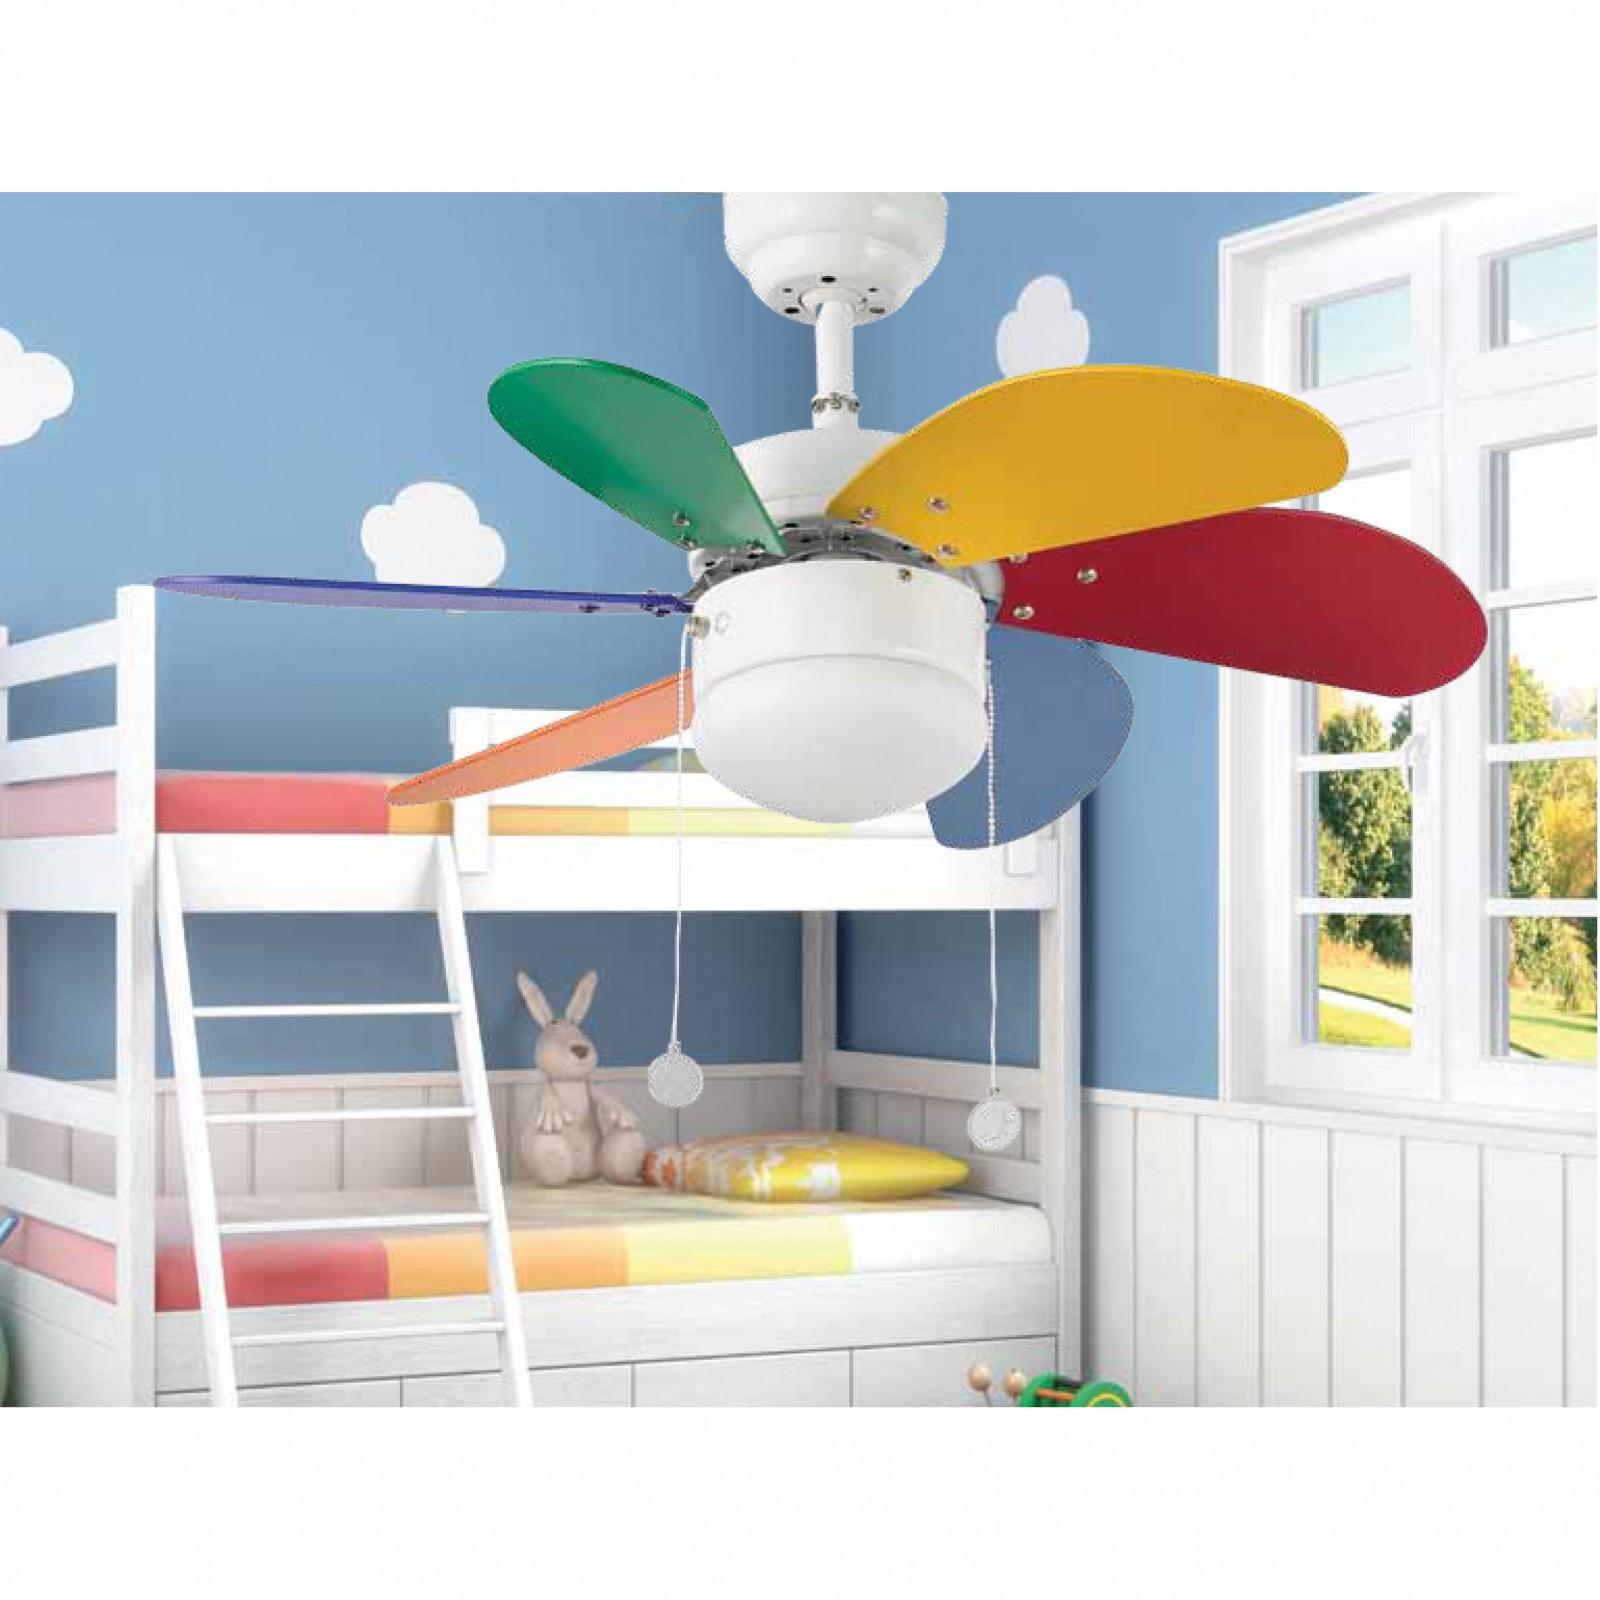 Ceiling Fan Palao Multicolor 81cm 32